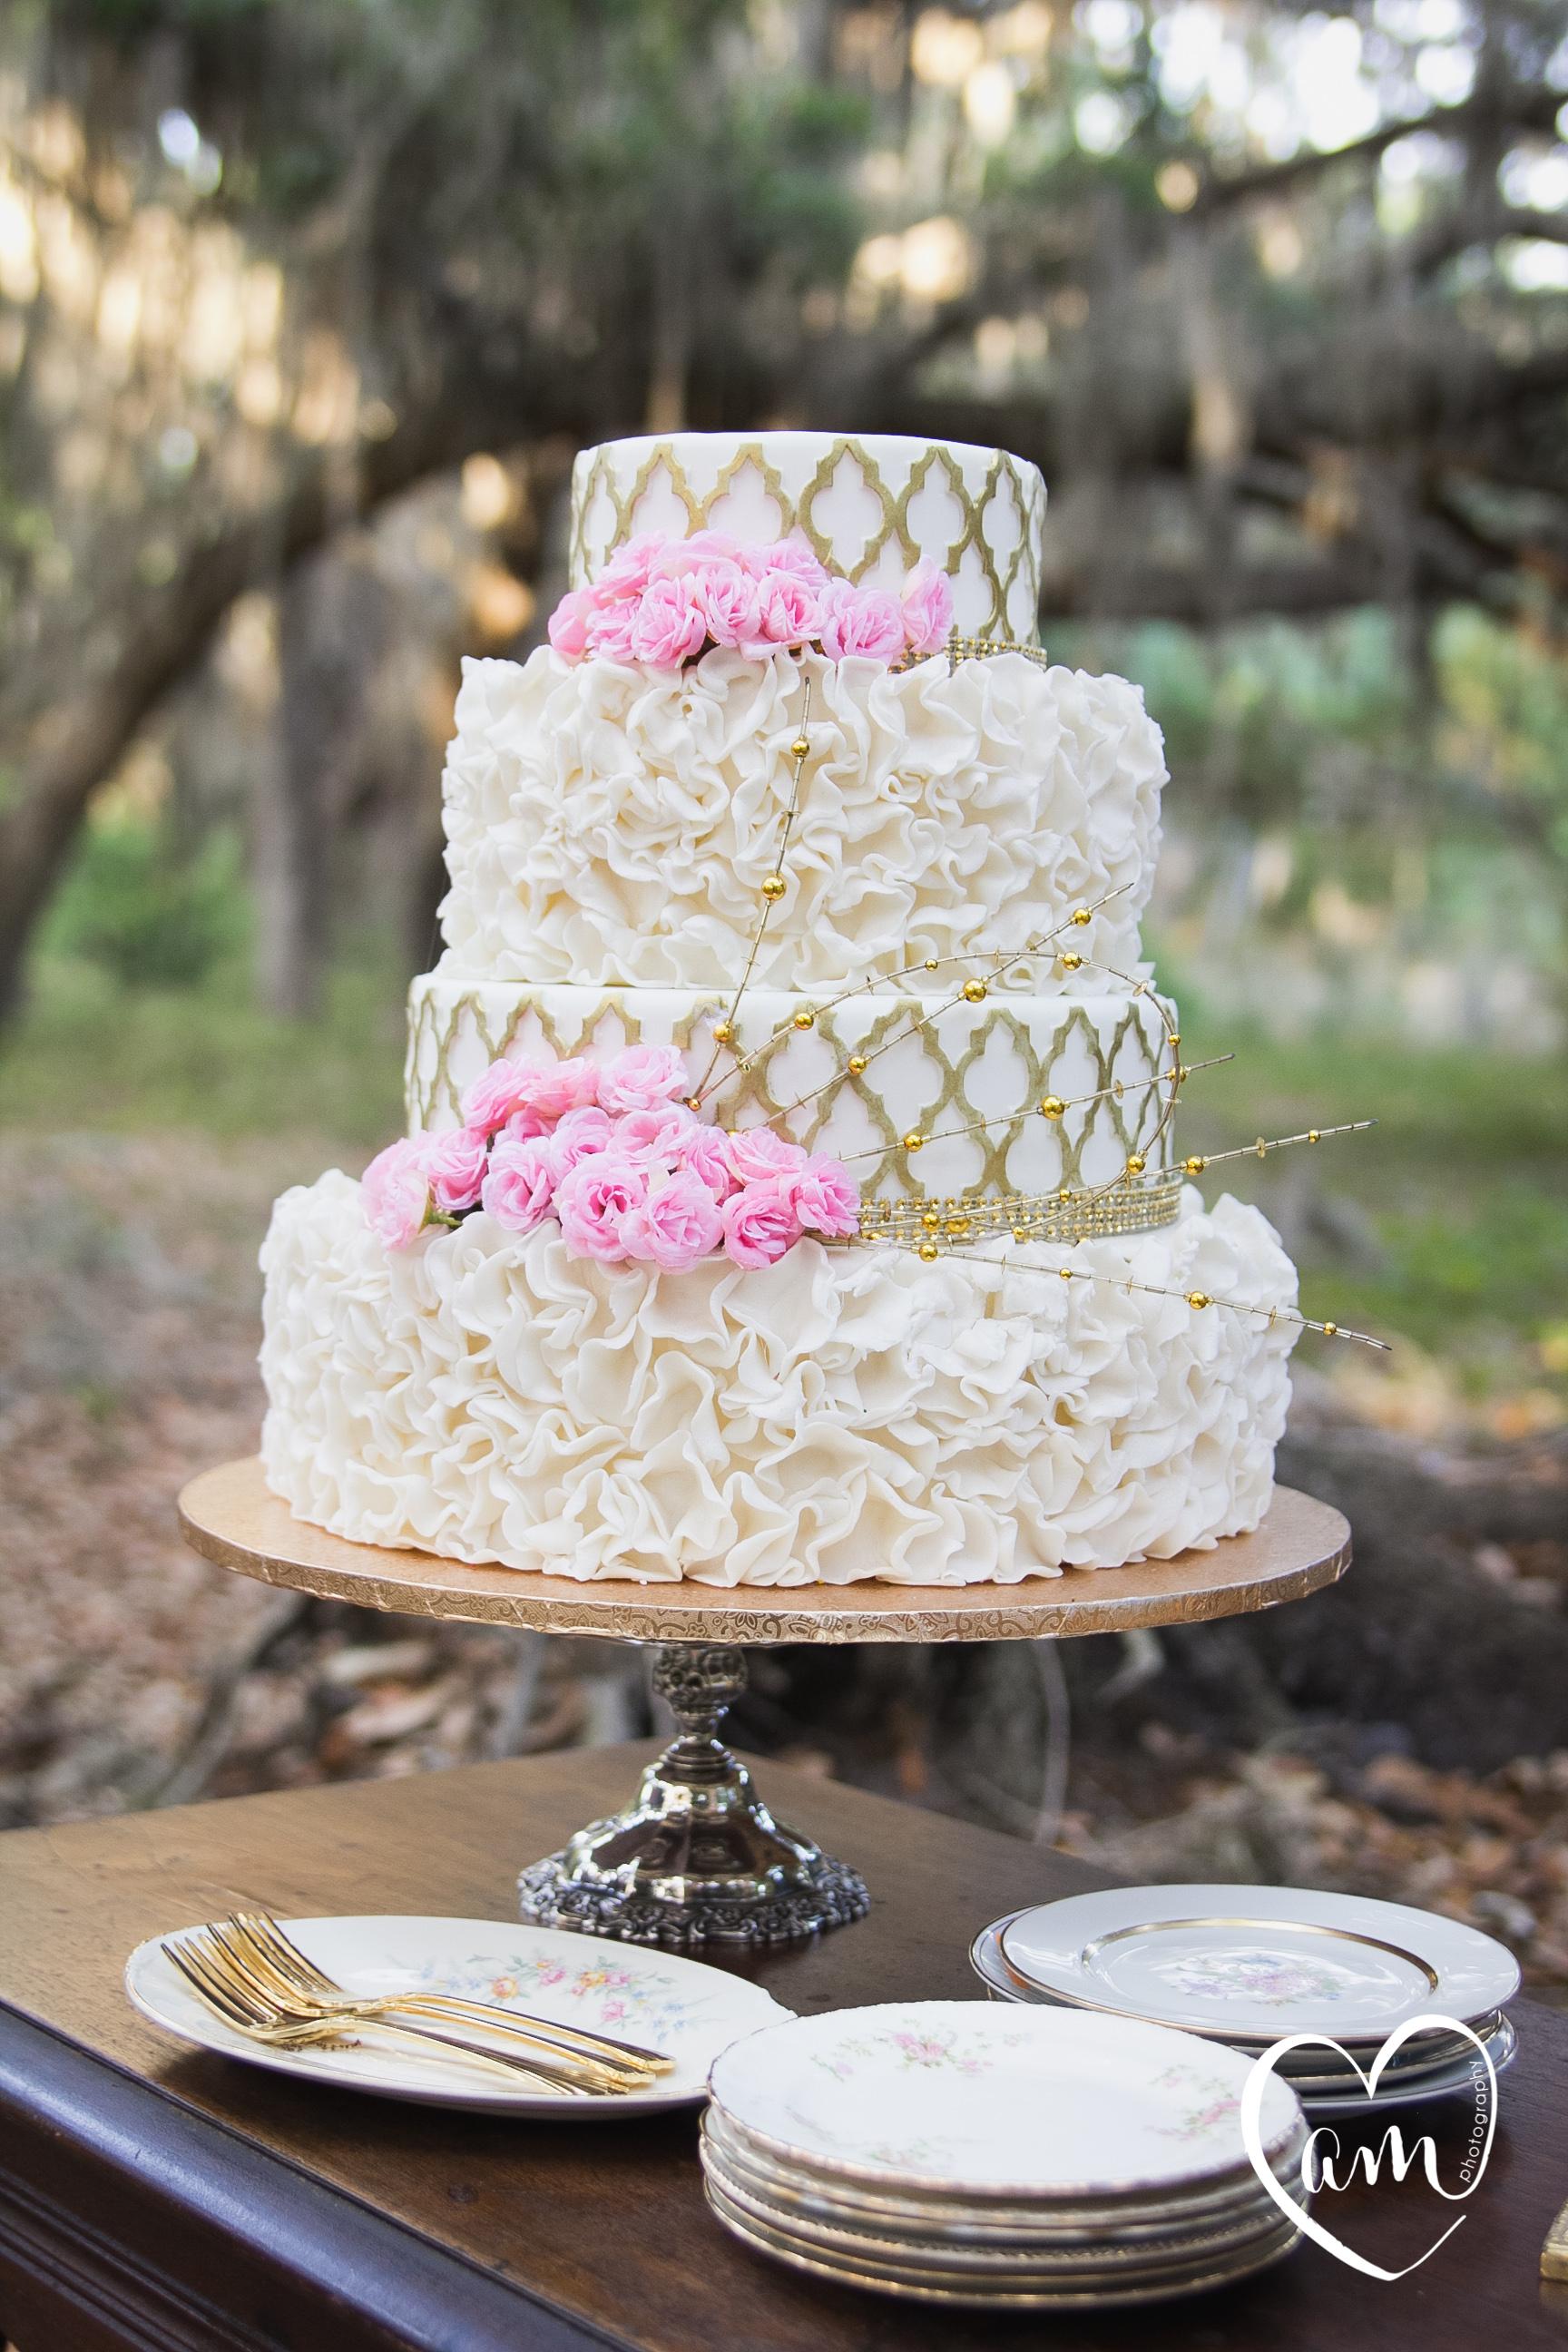 White and pink wedding cake photographed by Florida Destination Wedding Photographer